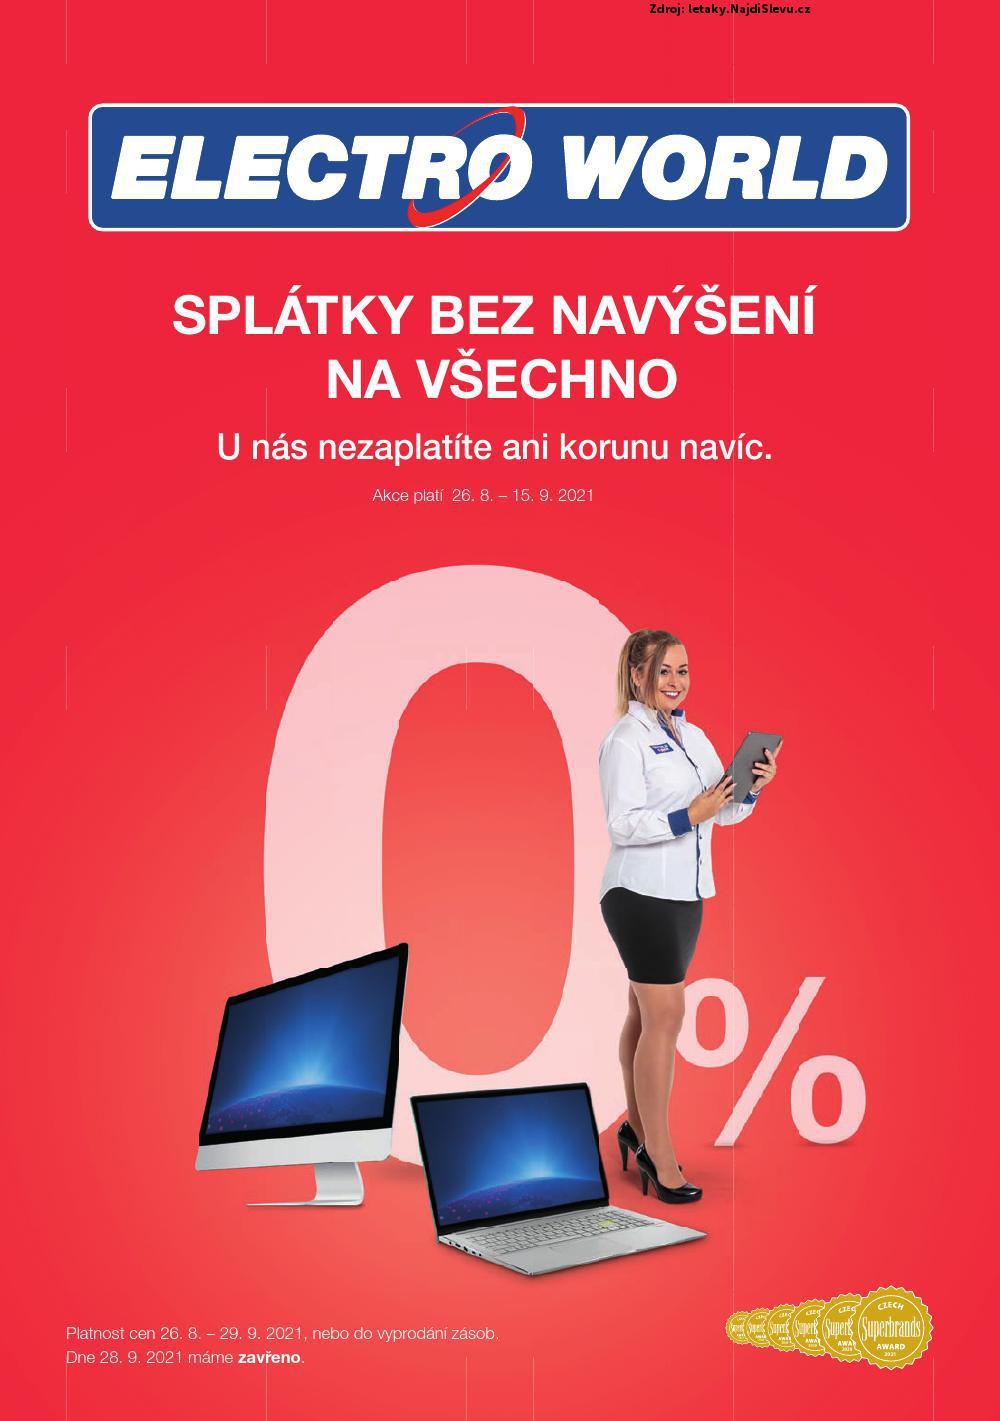 Strana 1 - leták Electro World (26. 8. - 29. 9. 2021)